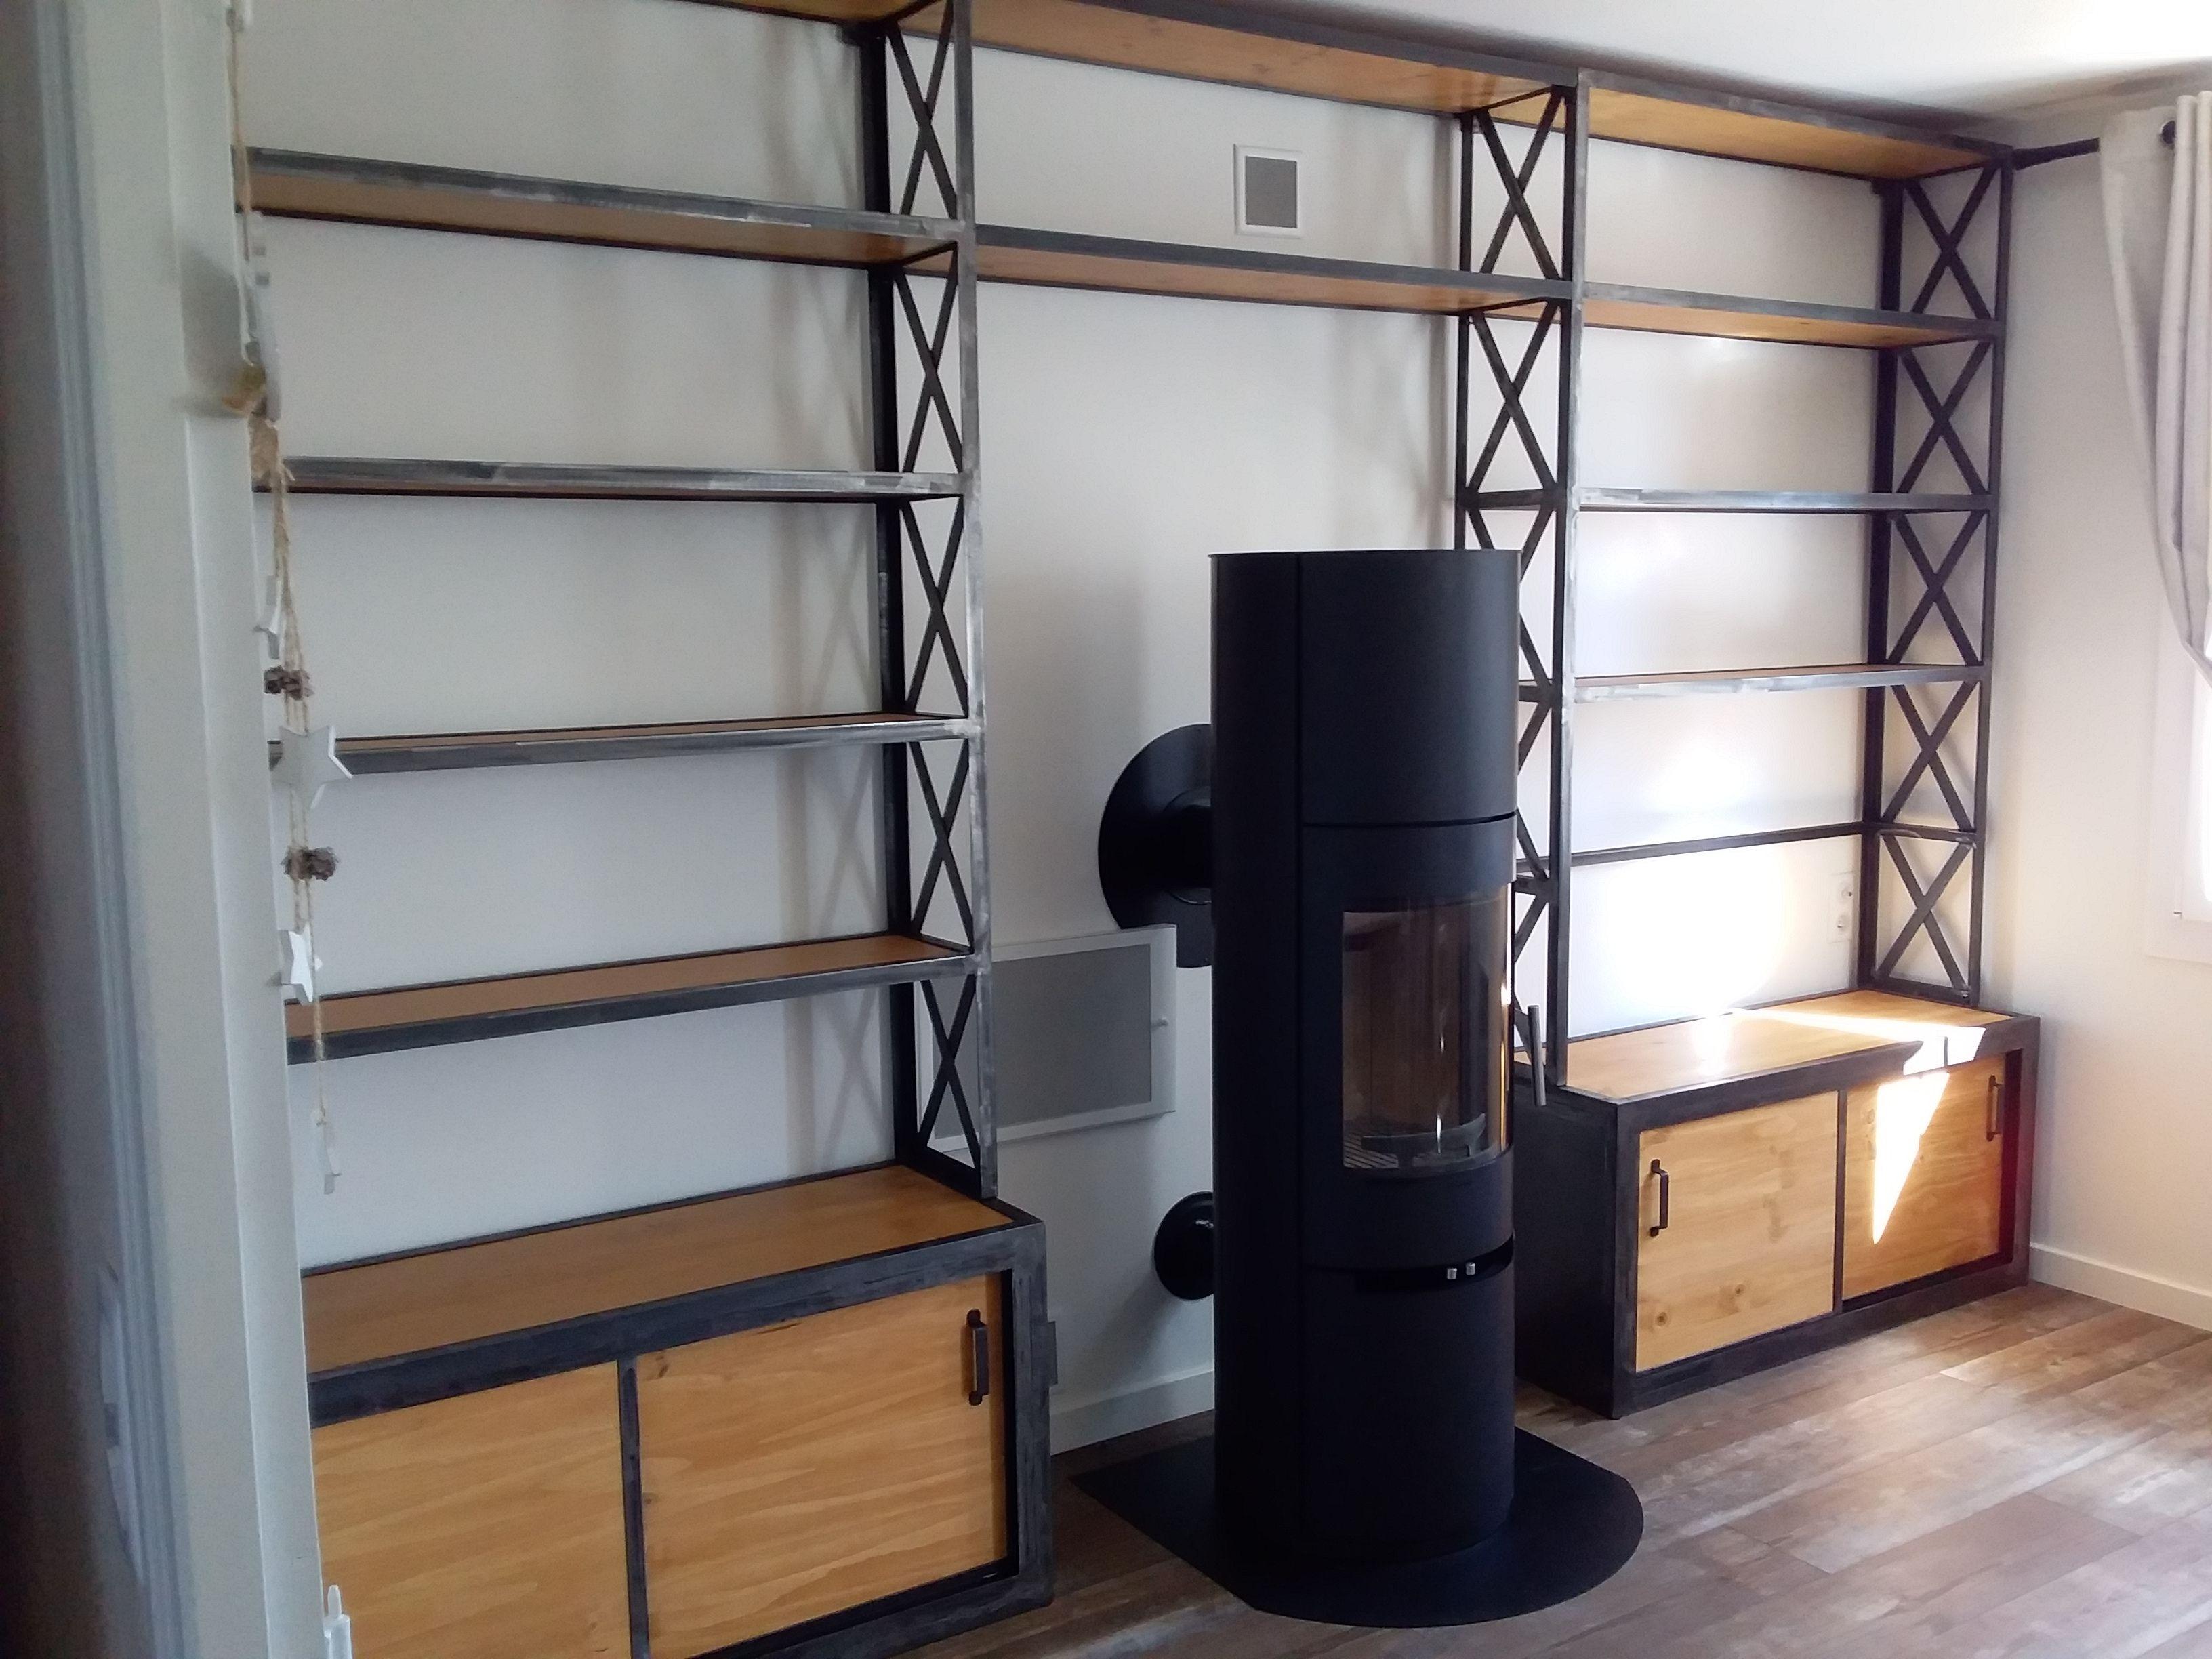 Bibliotheque Sur Mesure Restaurer Meuble Meubles Industriels Meuble